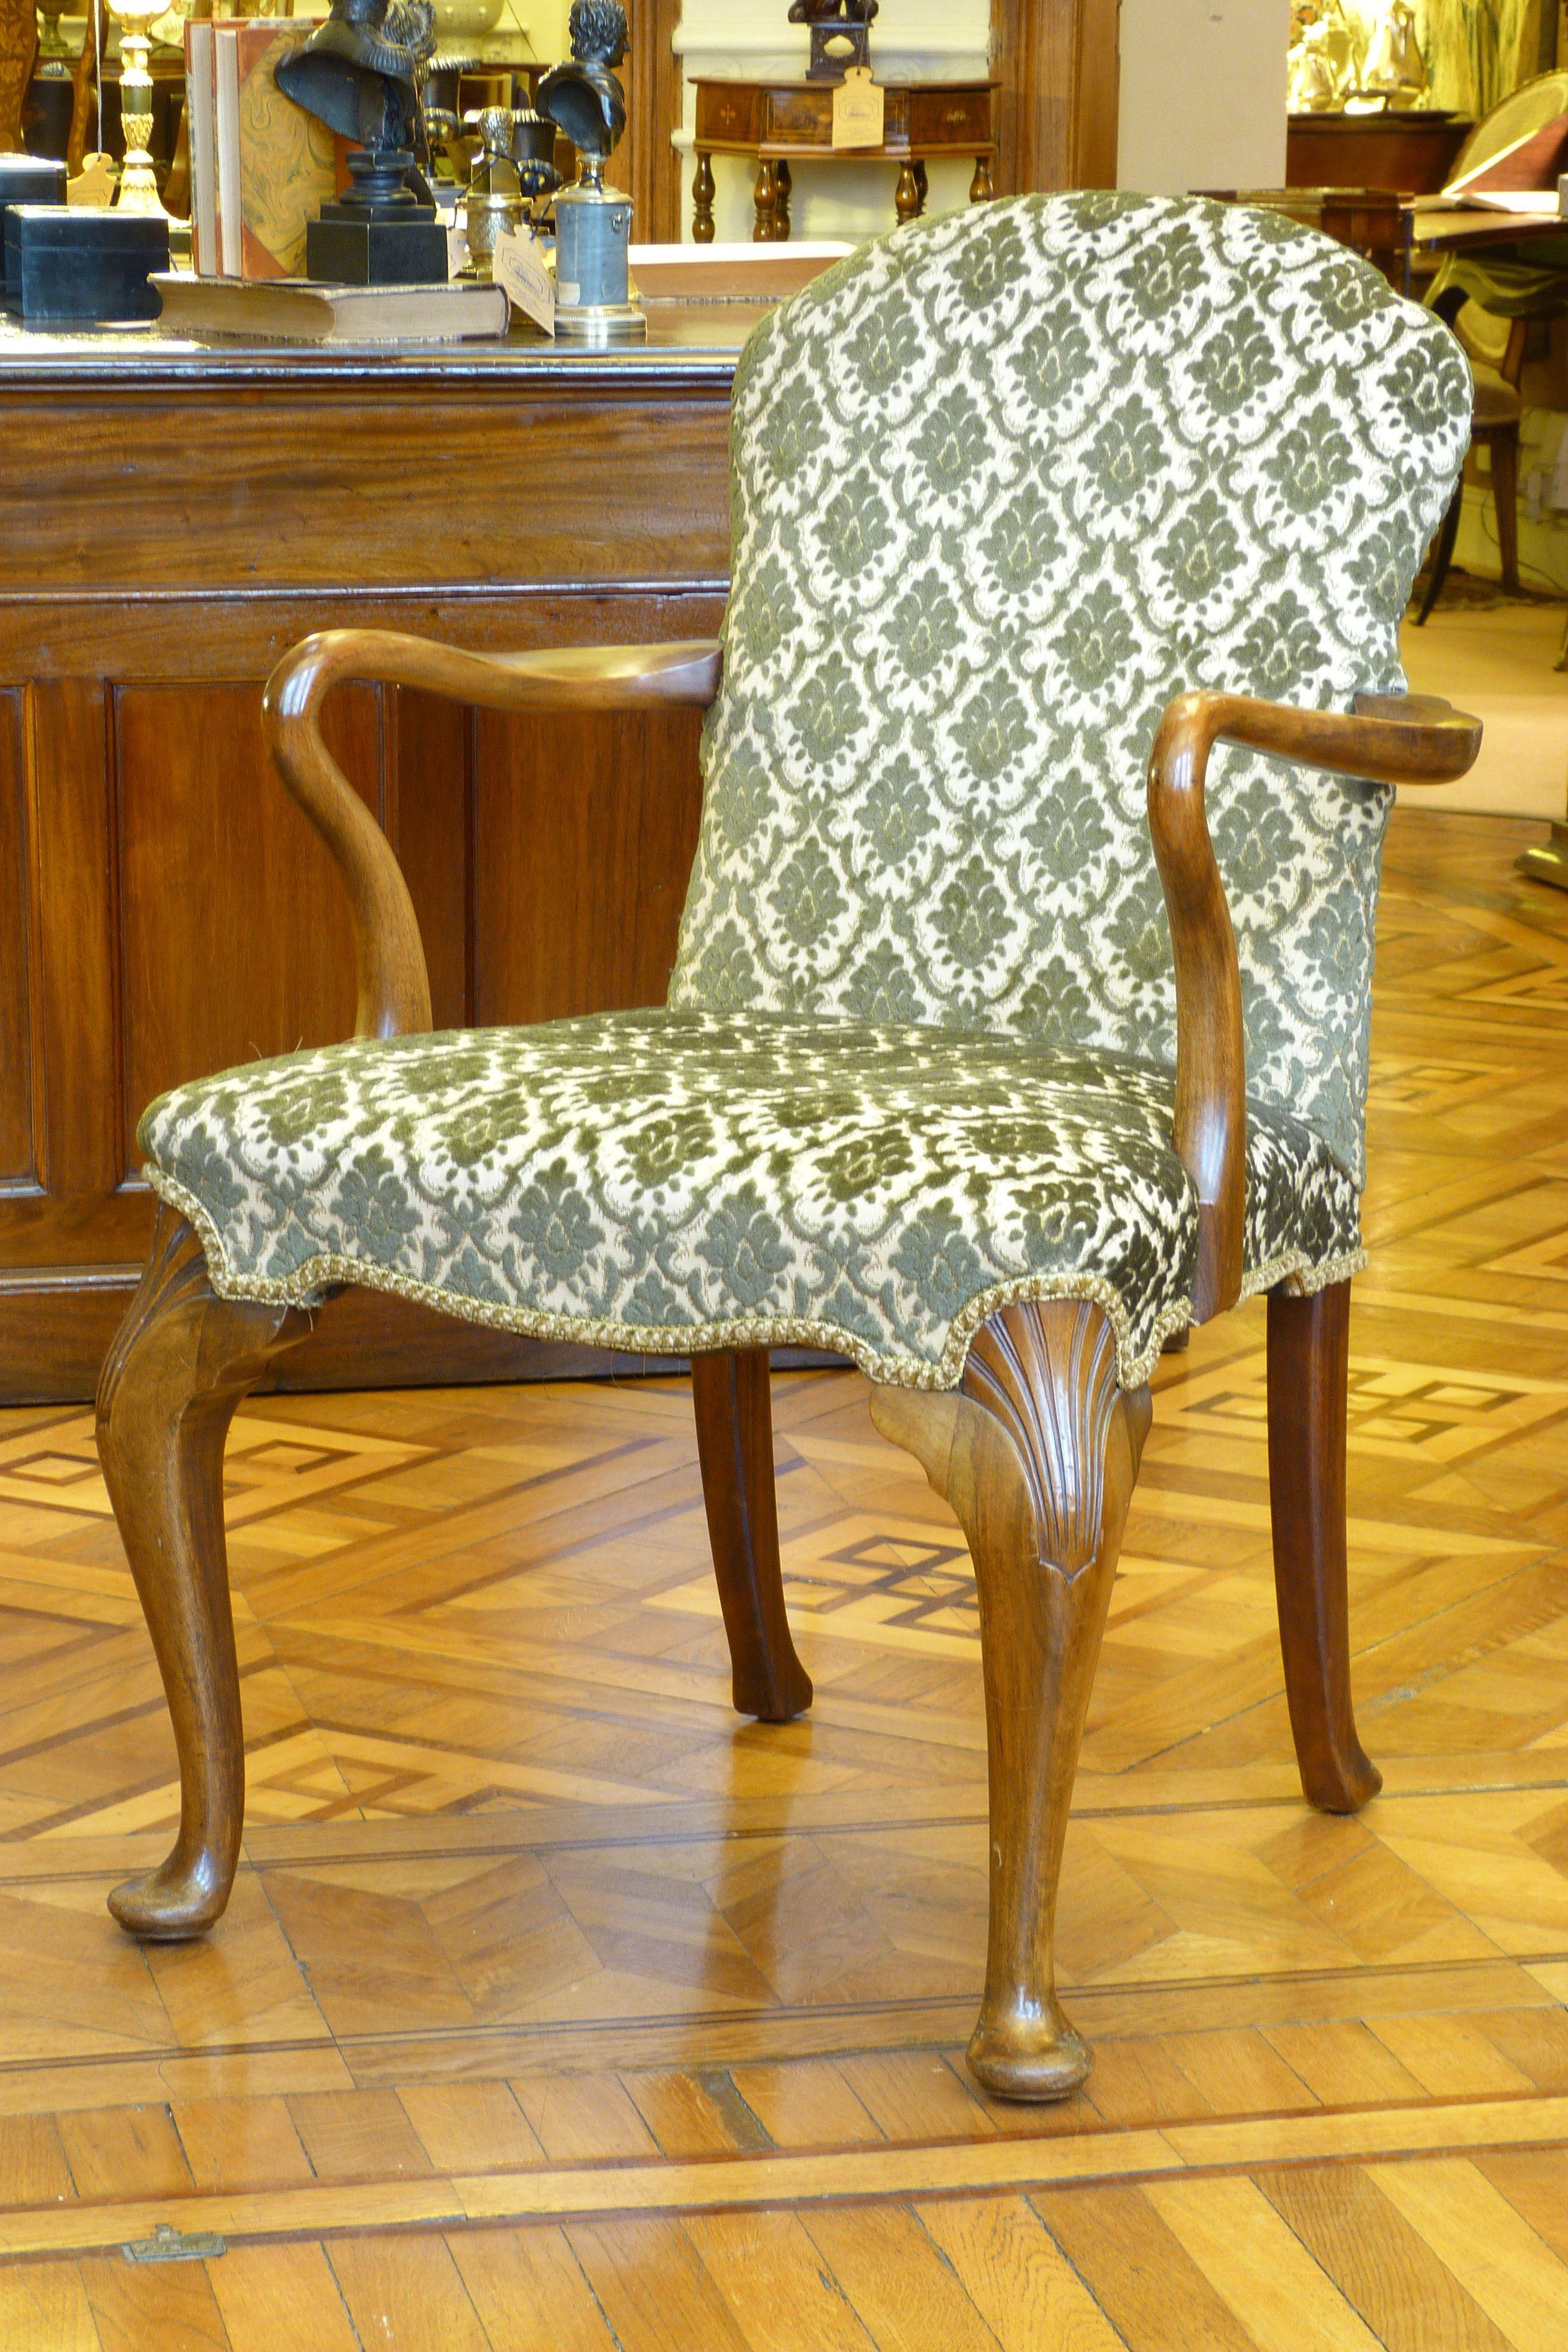 En Mayflower podés encontrar una par de sillones ingleses ...